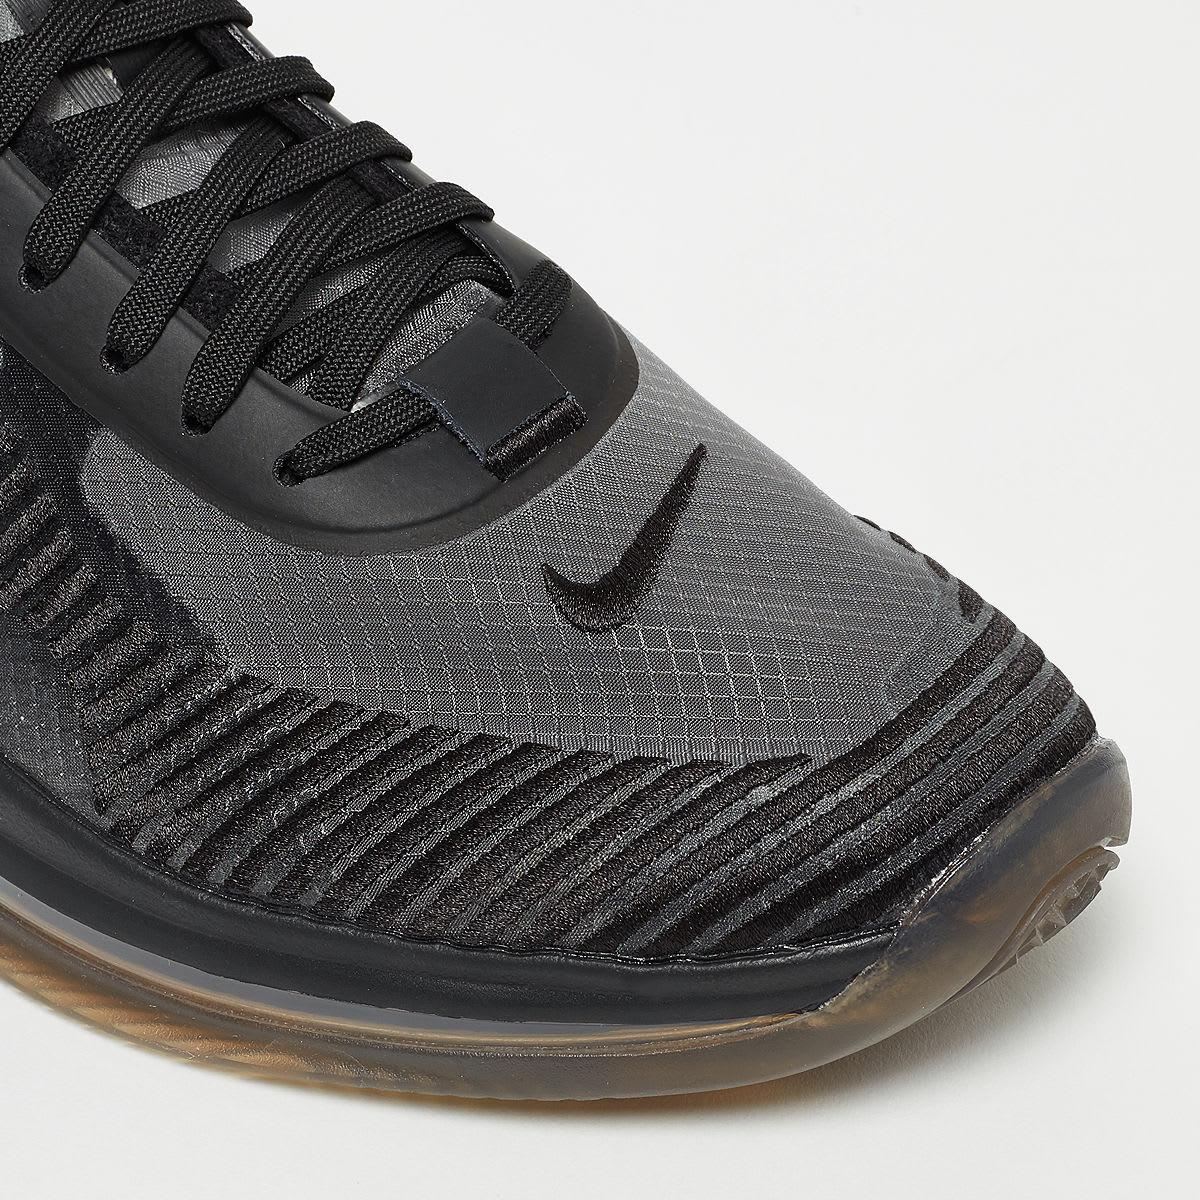 John Elliott x Nike LeBron Icon QS 'Black/Gum' AQ0114-001 (Toe)